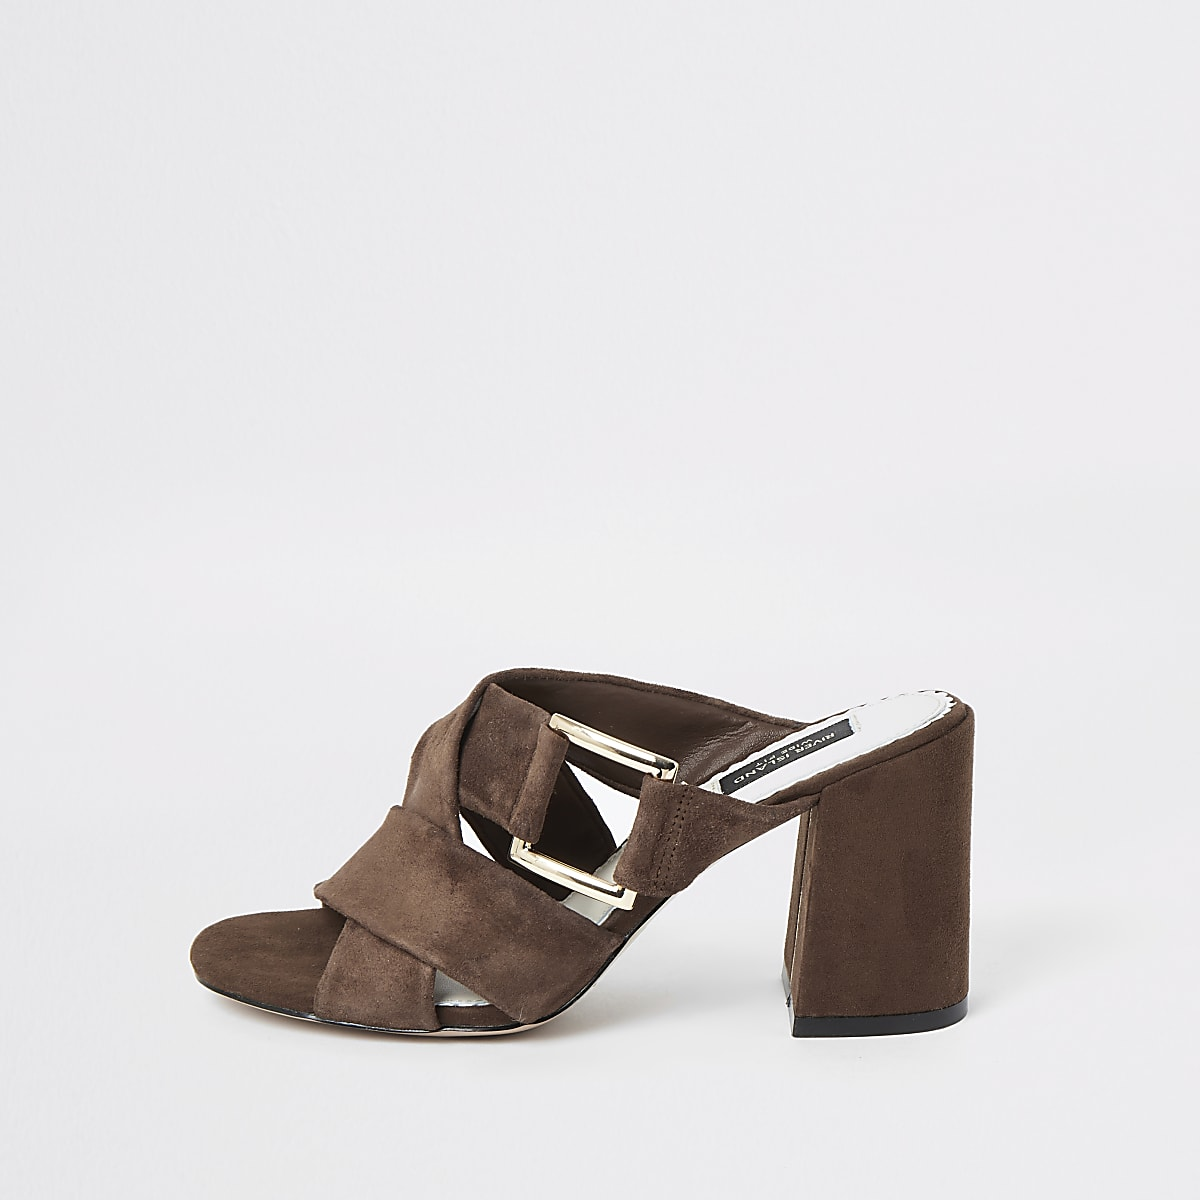 Brown suede wide fit sandals